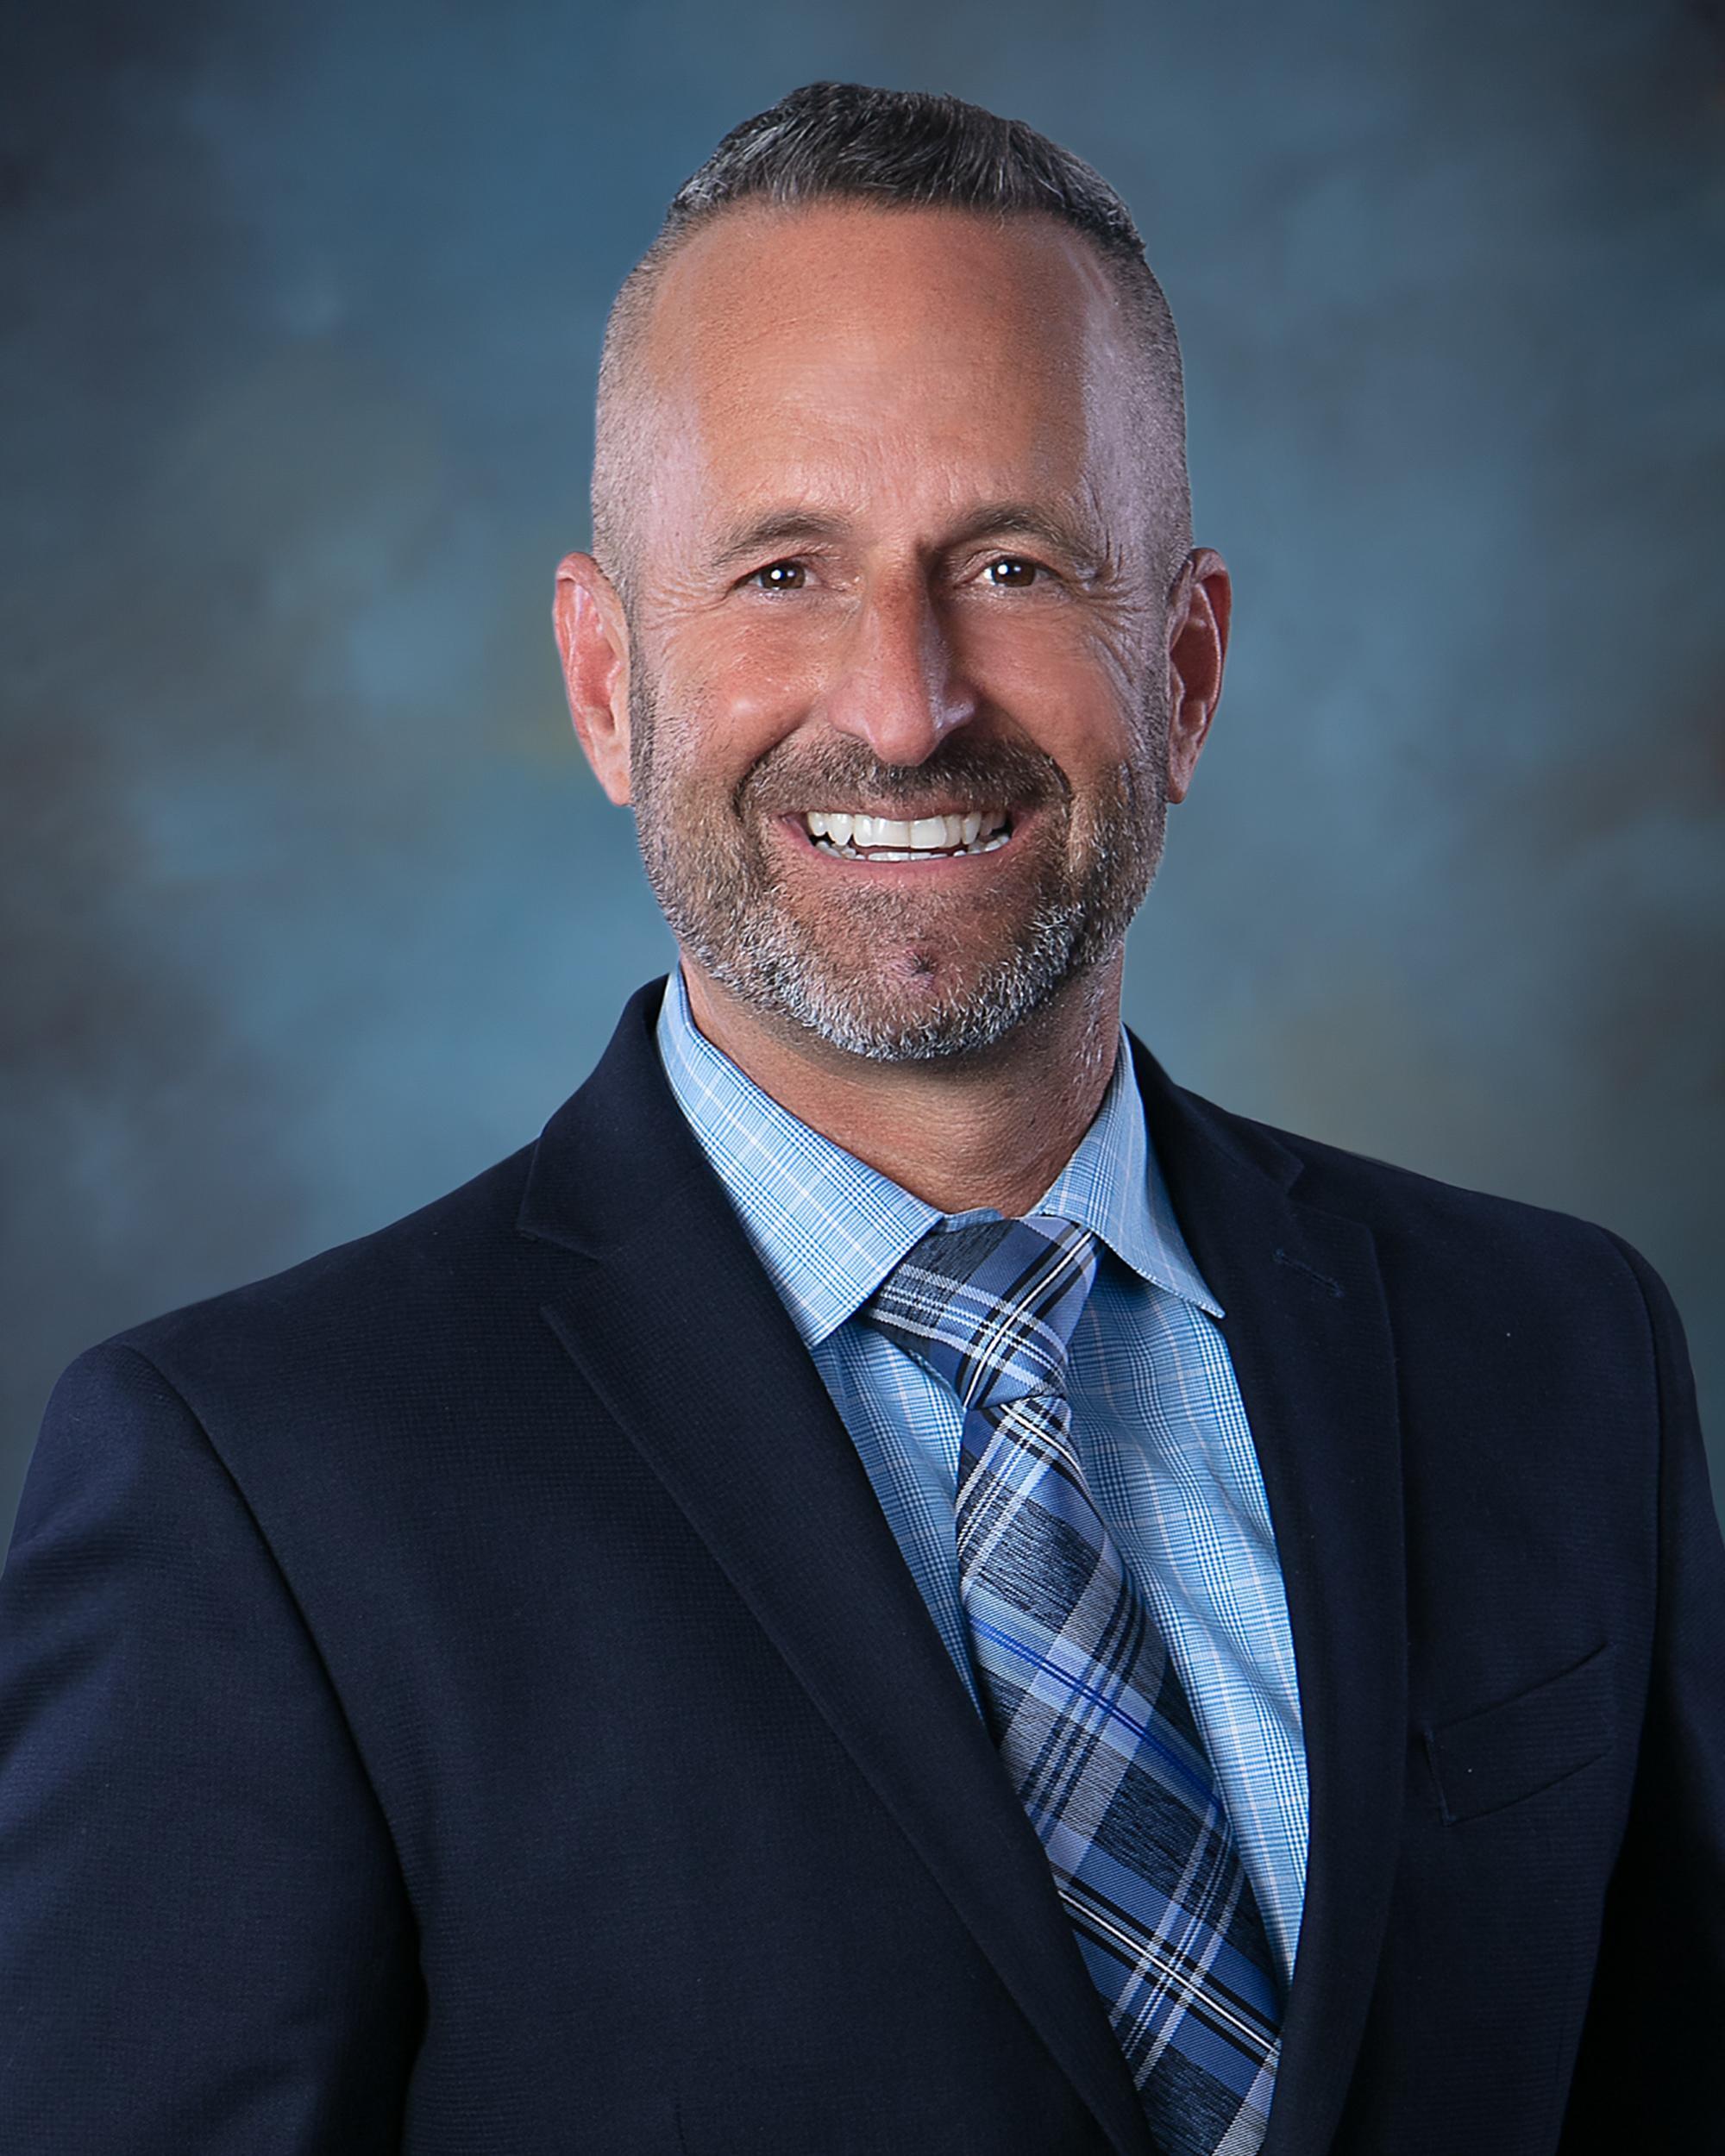 Superintendent Marc Patterson